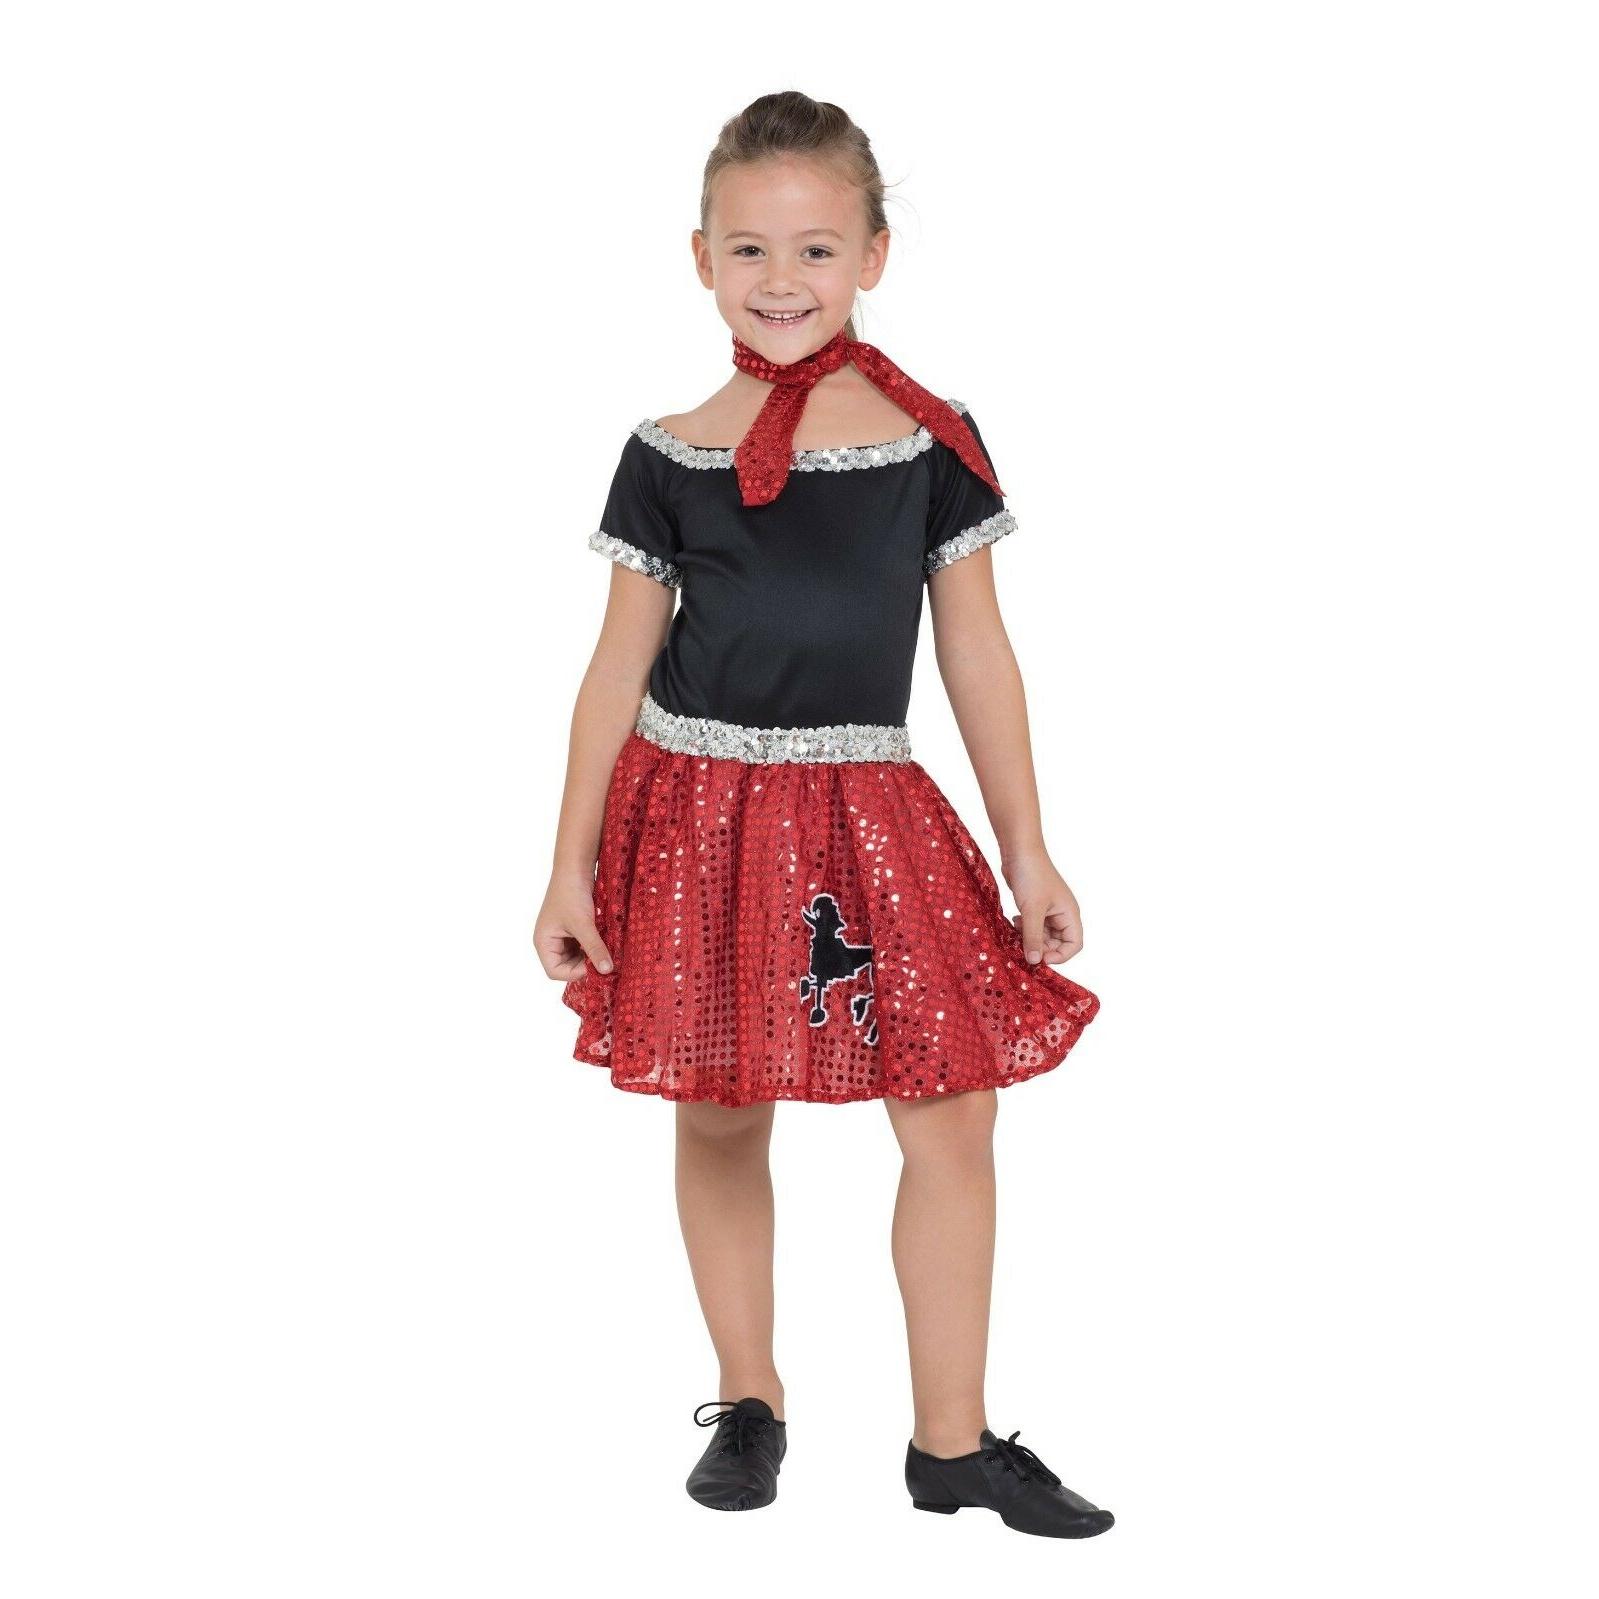 Bristol Novelty Childrens/Girls Rock N Roll Sequin Dress (M) (Red/Black)